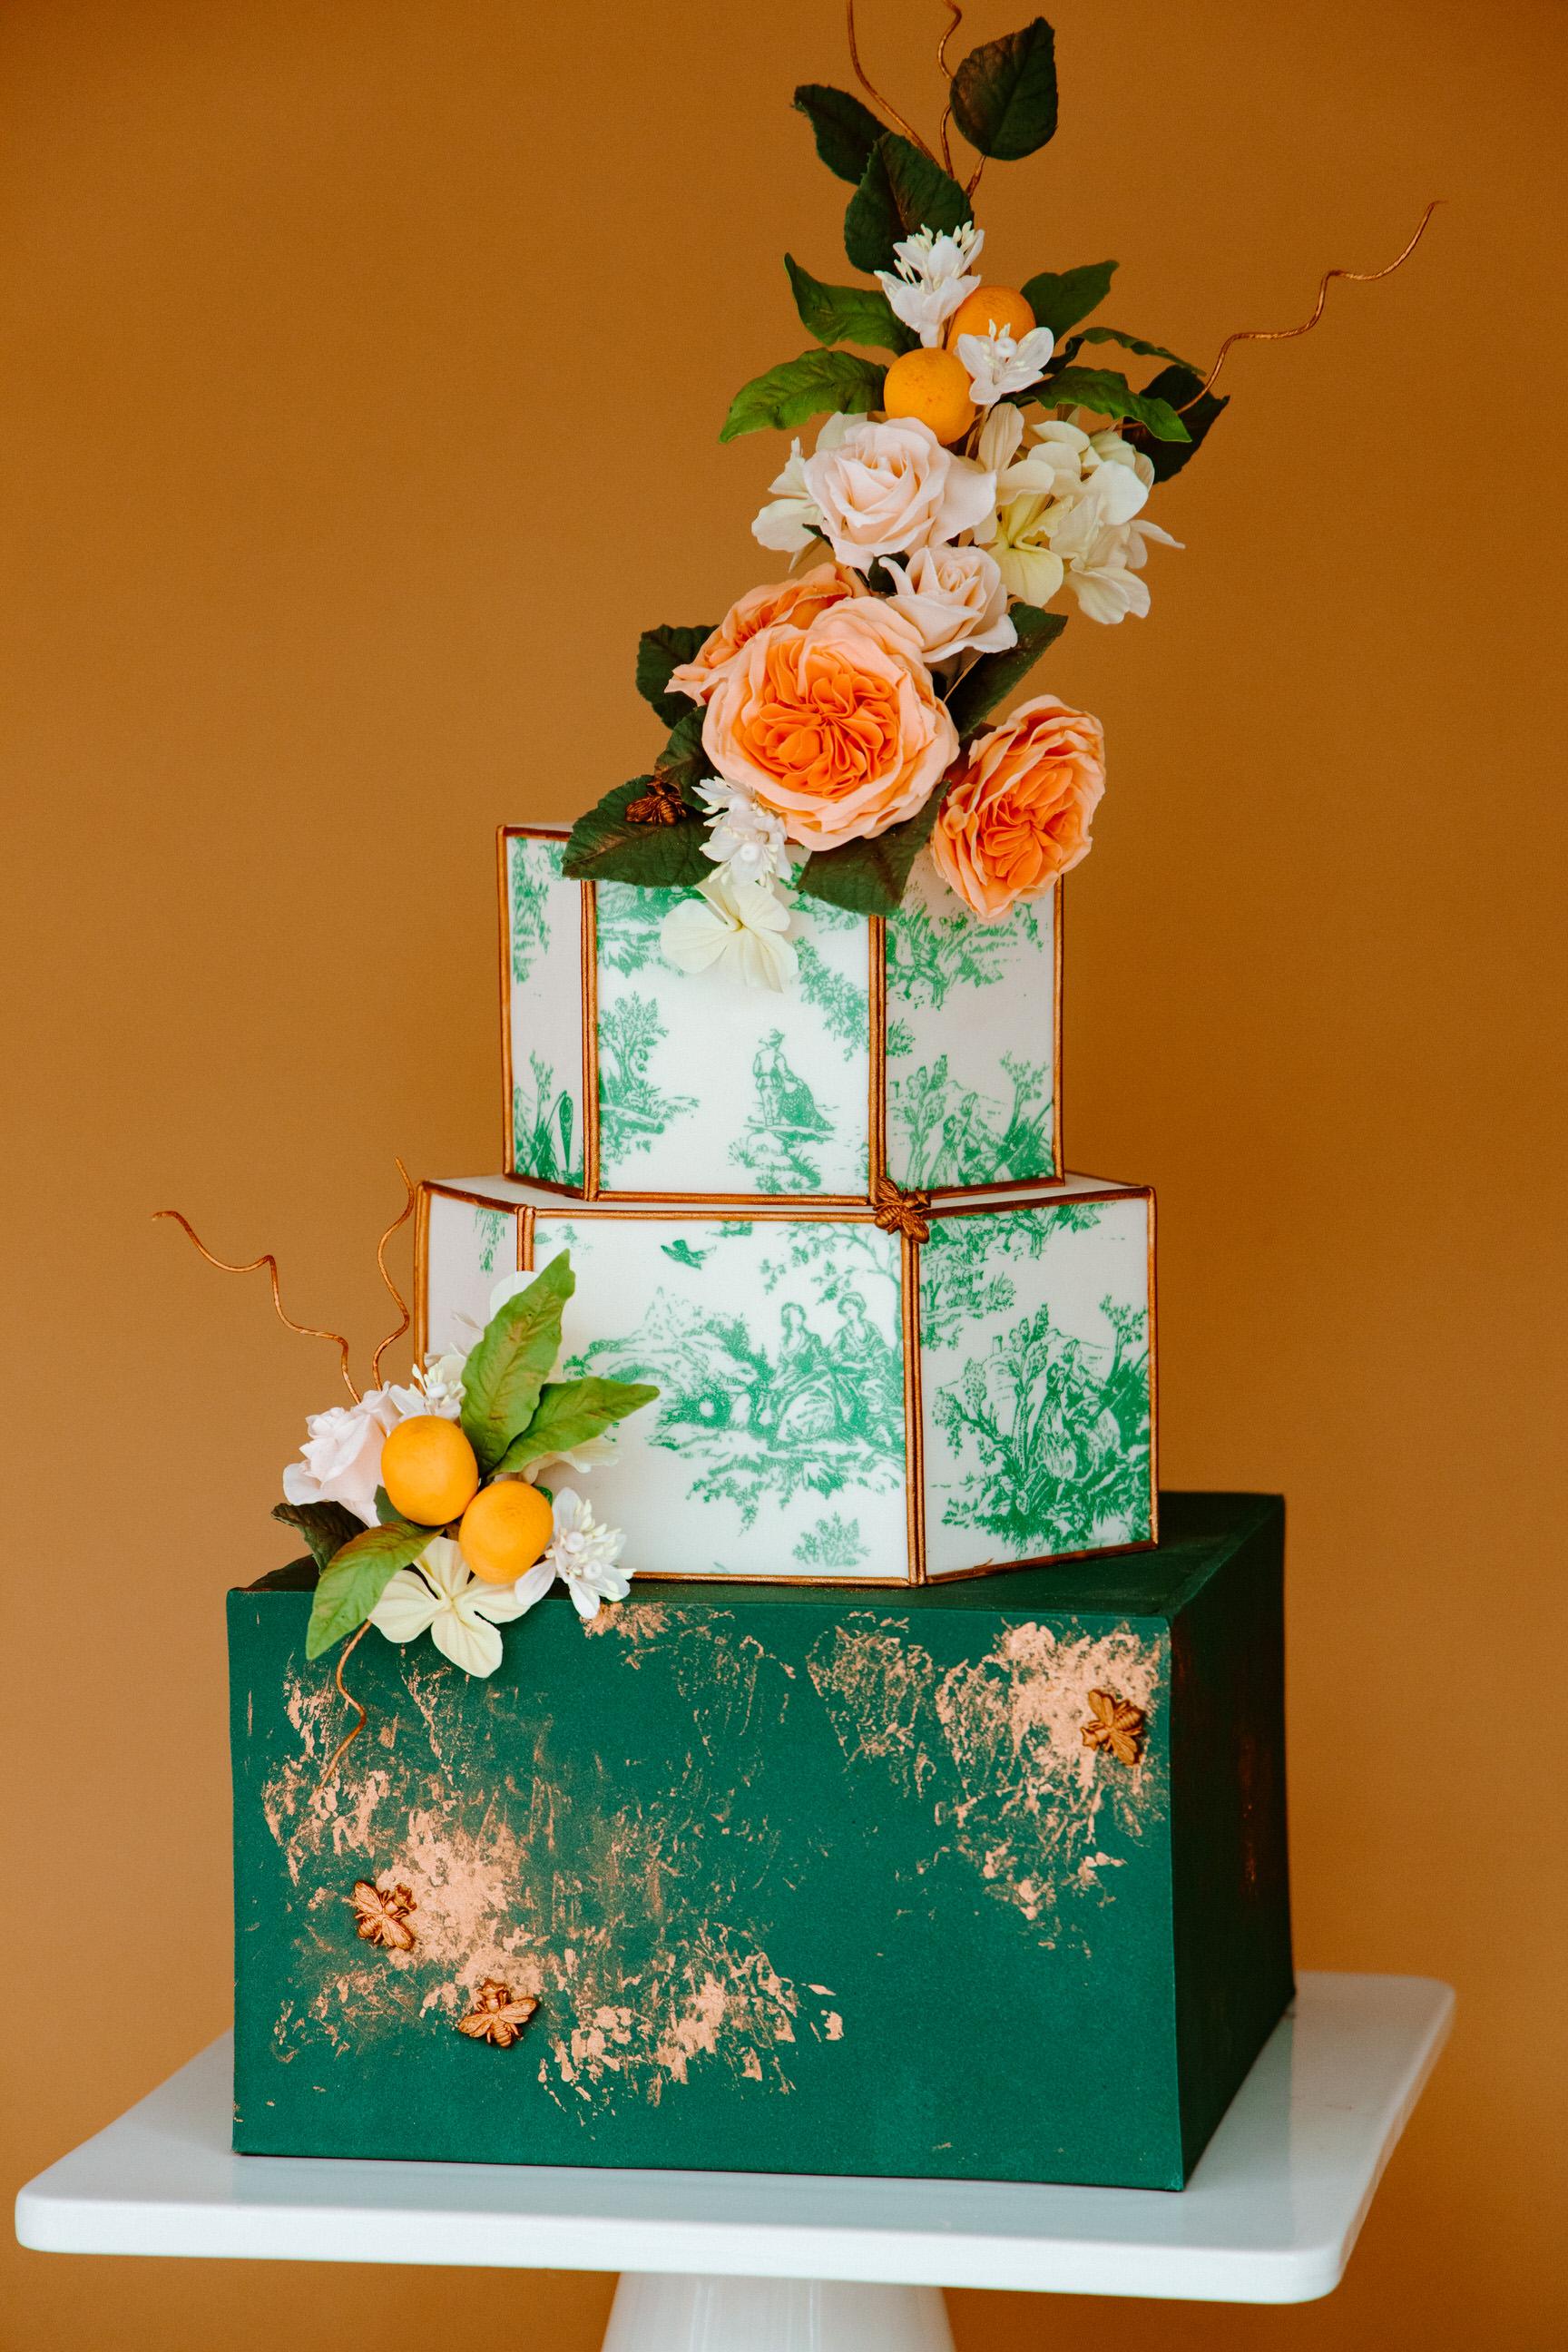 gateaux-cake-7403.jpg